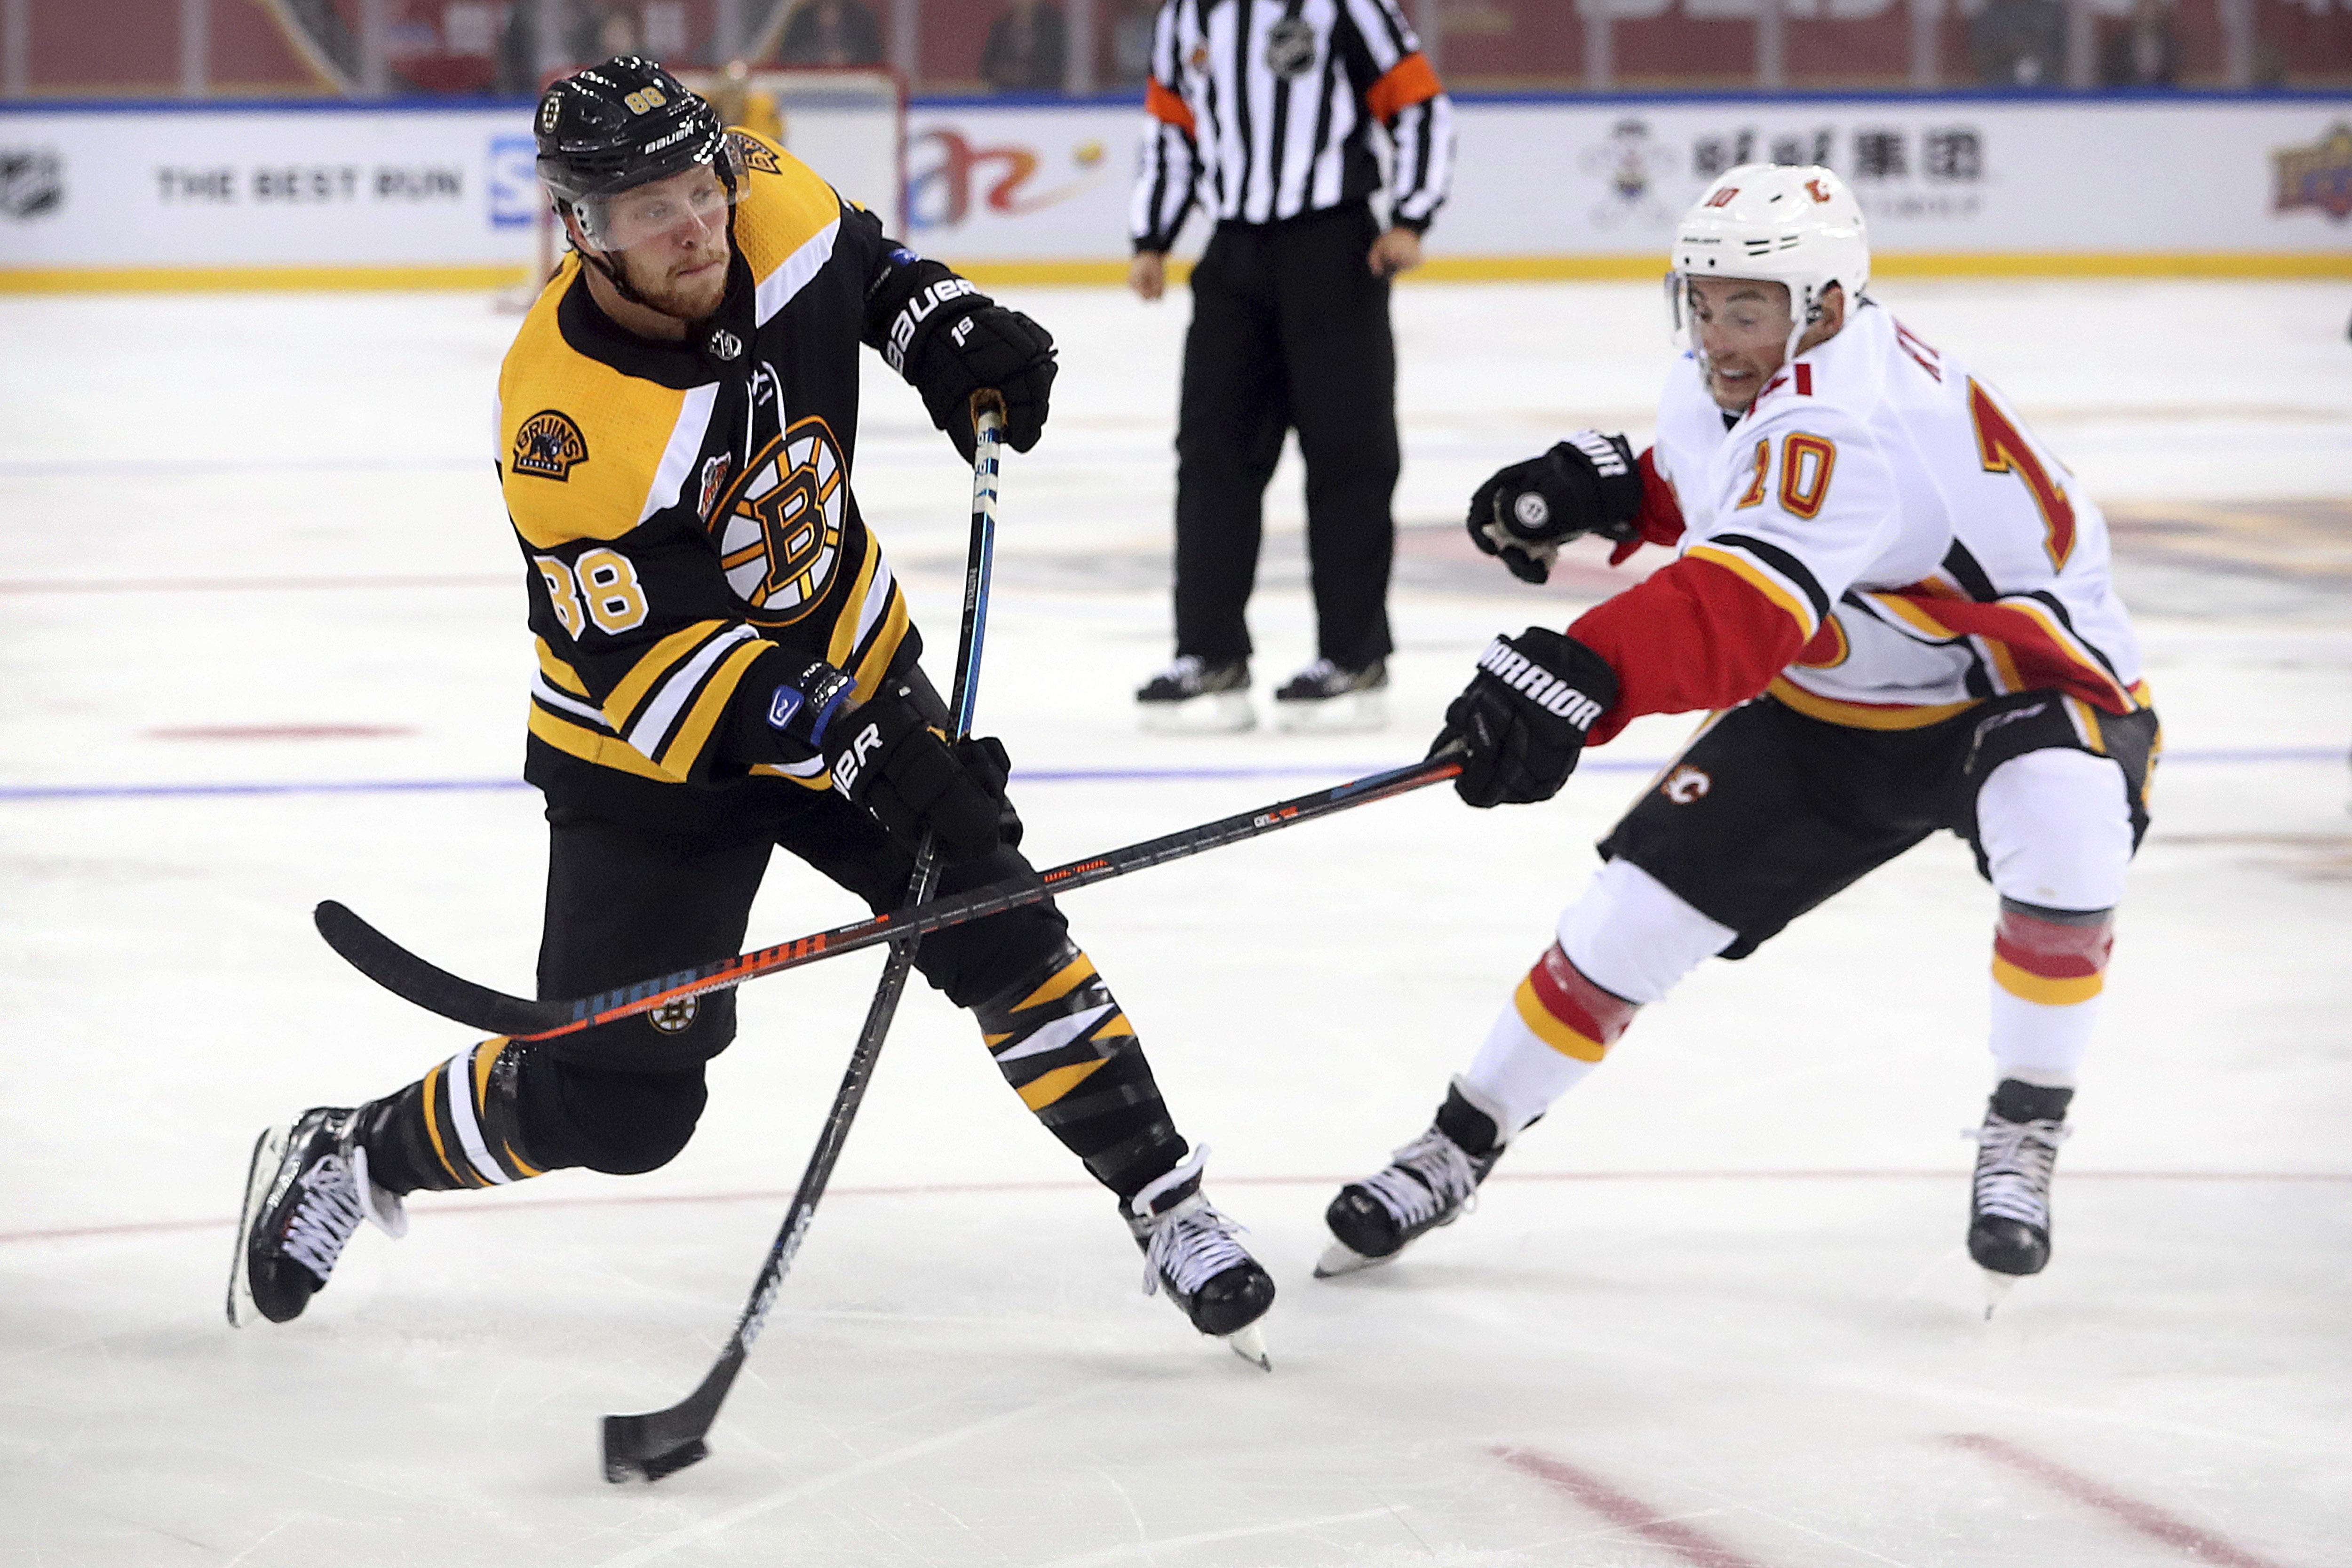 Regular-season success not enough for Bruins this year